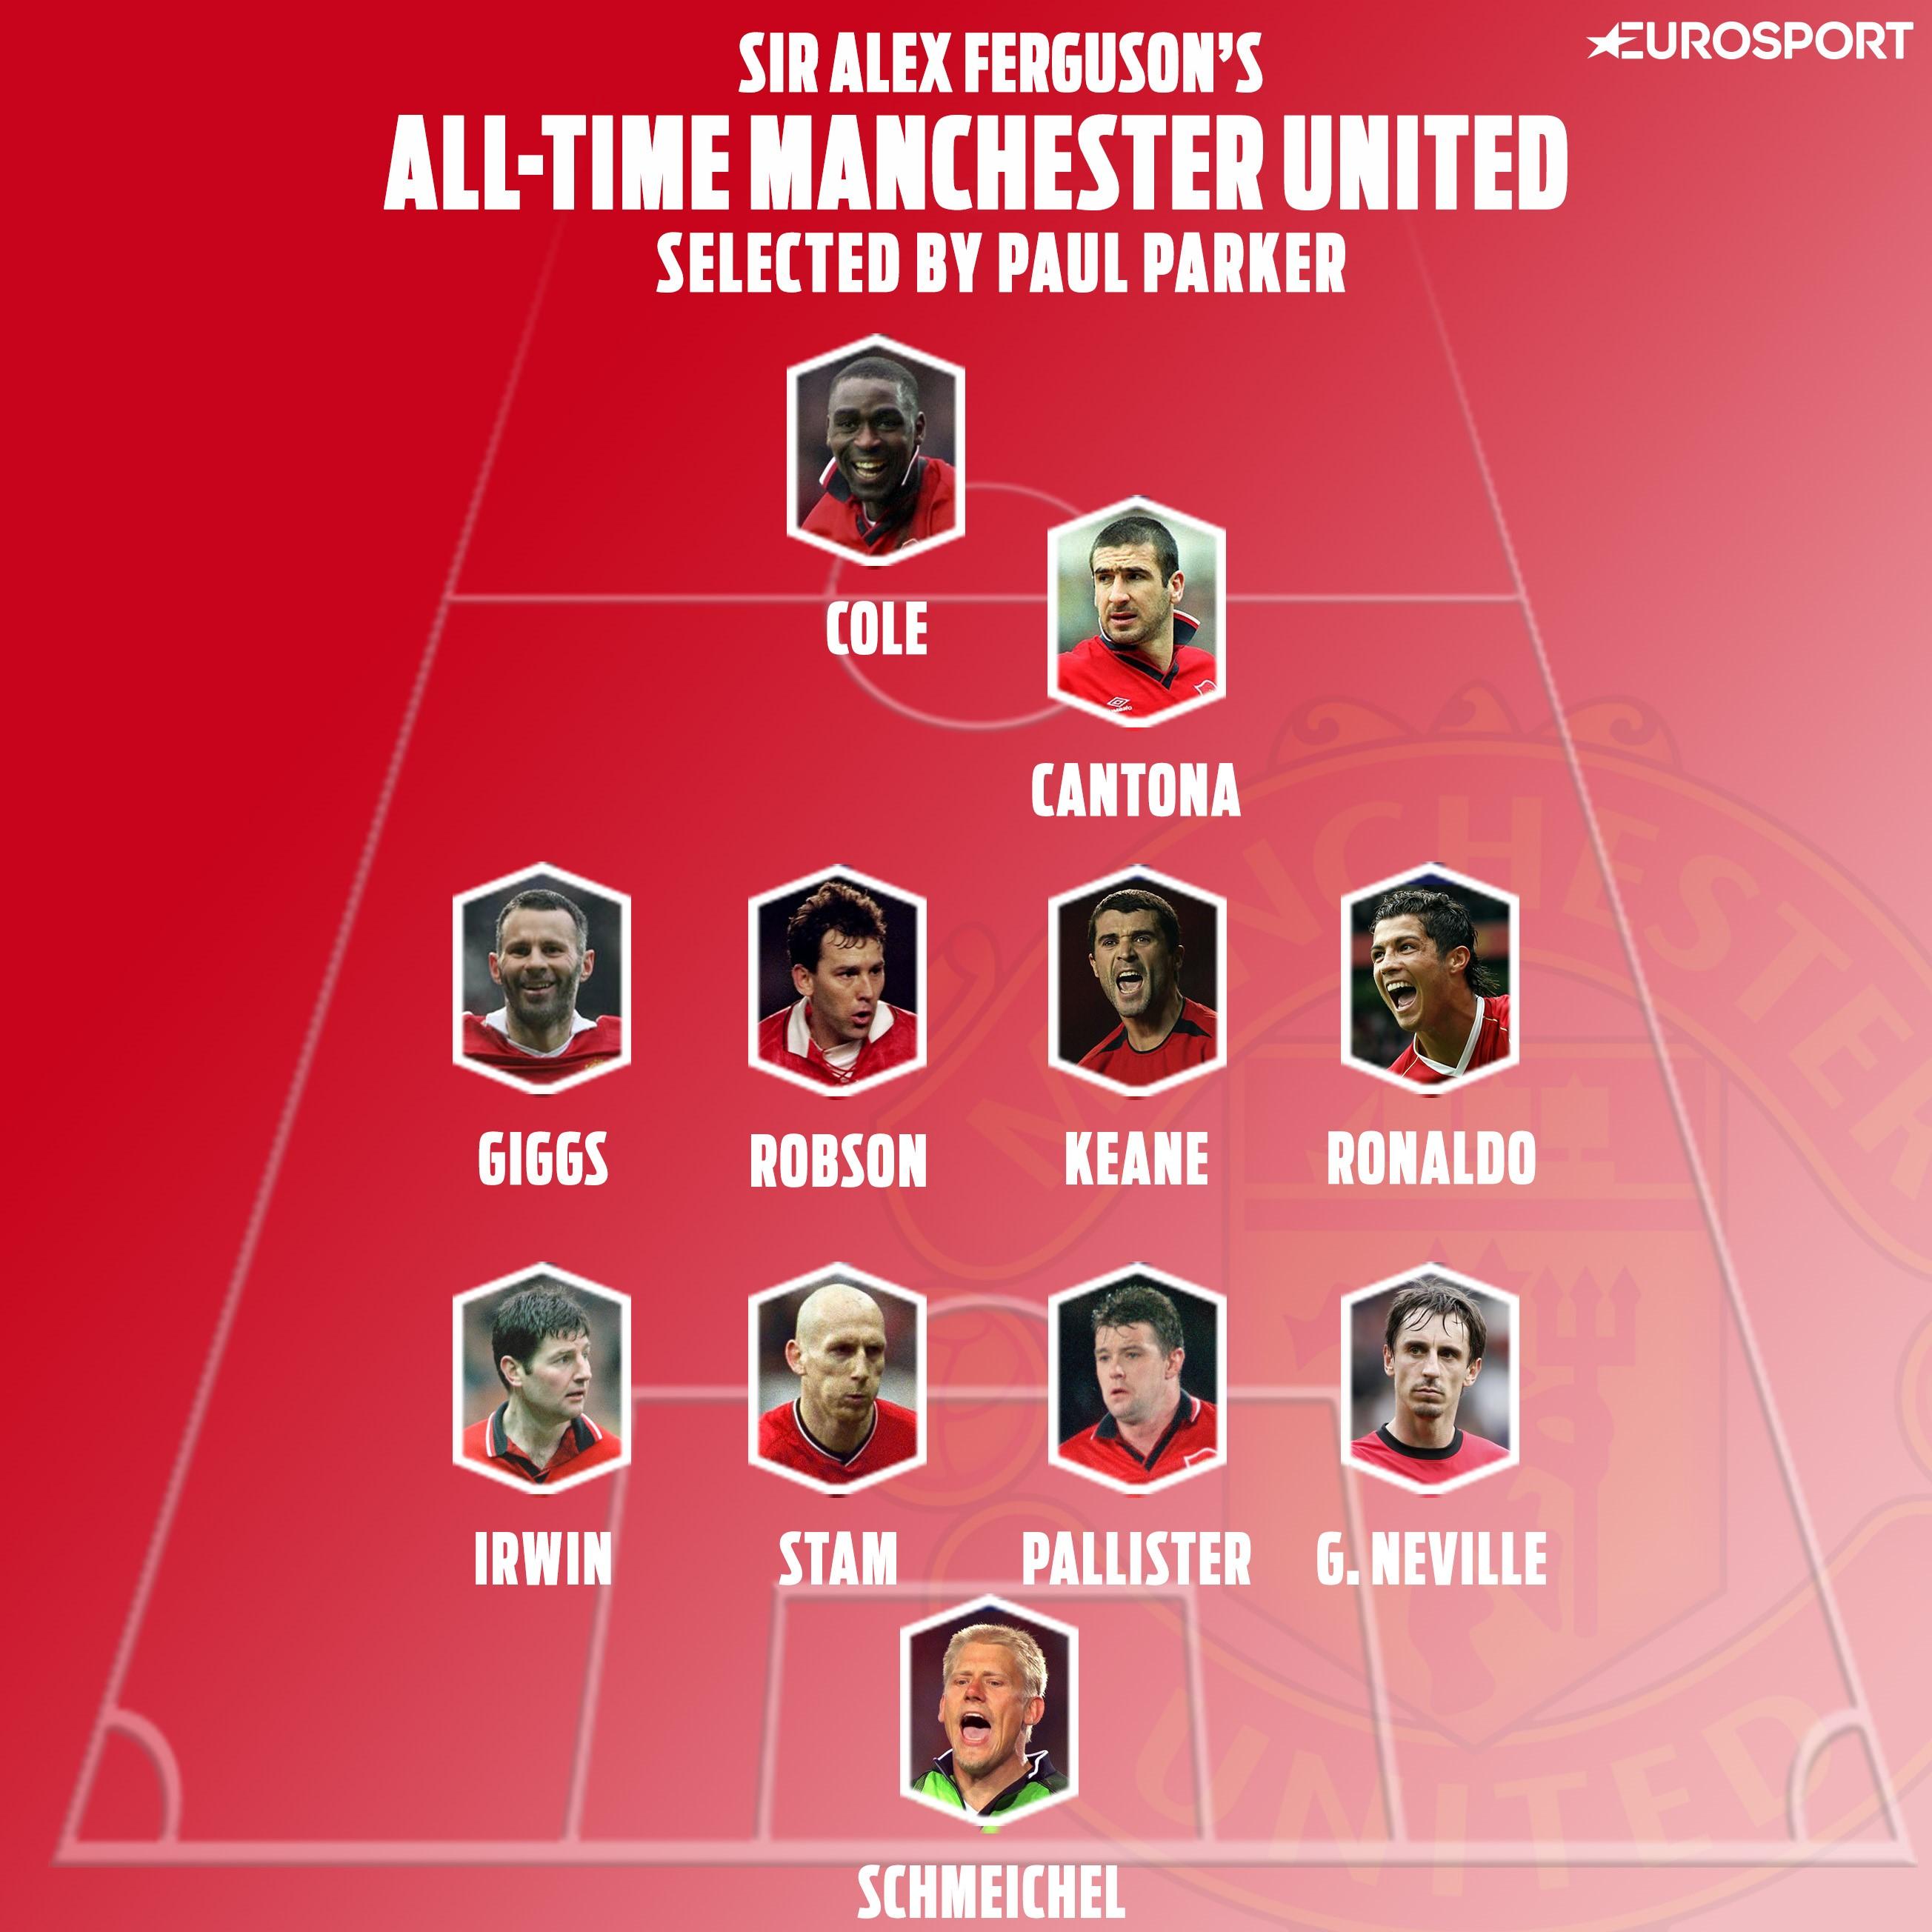 Paul Parker picks Manchester United's greatest side under Sir Alex Ferguson